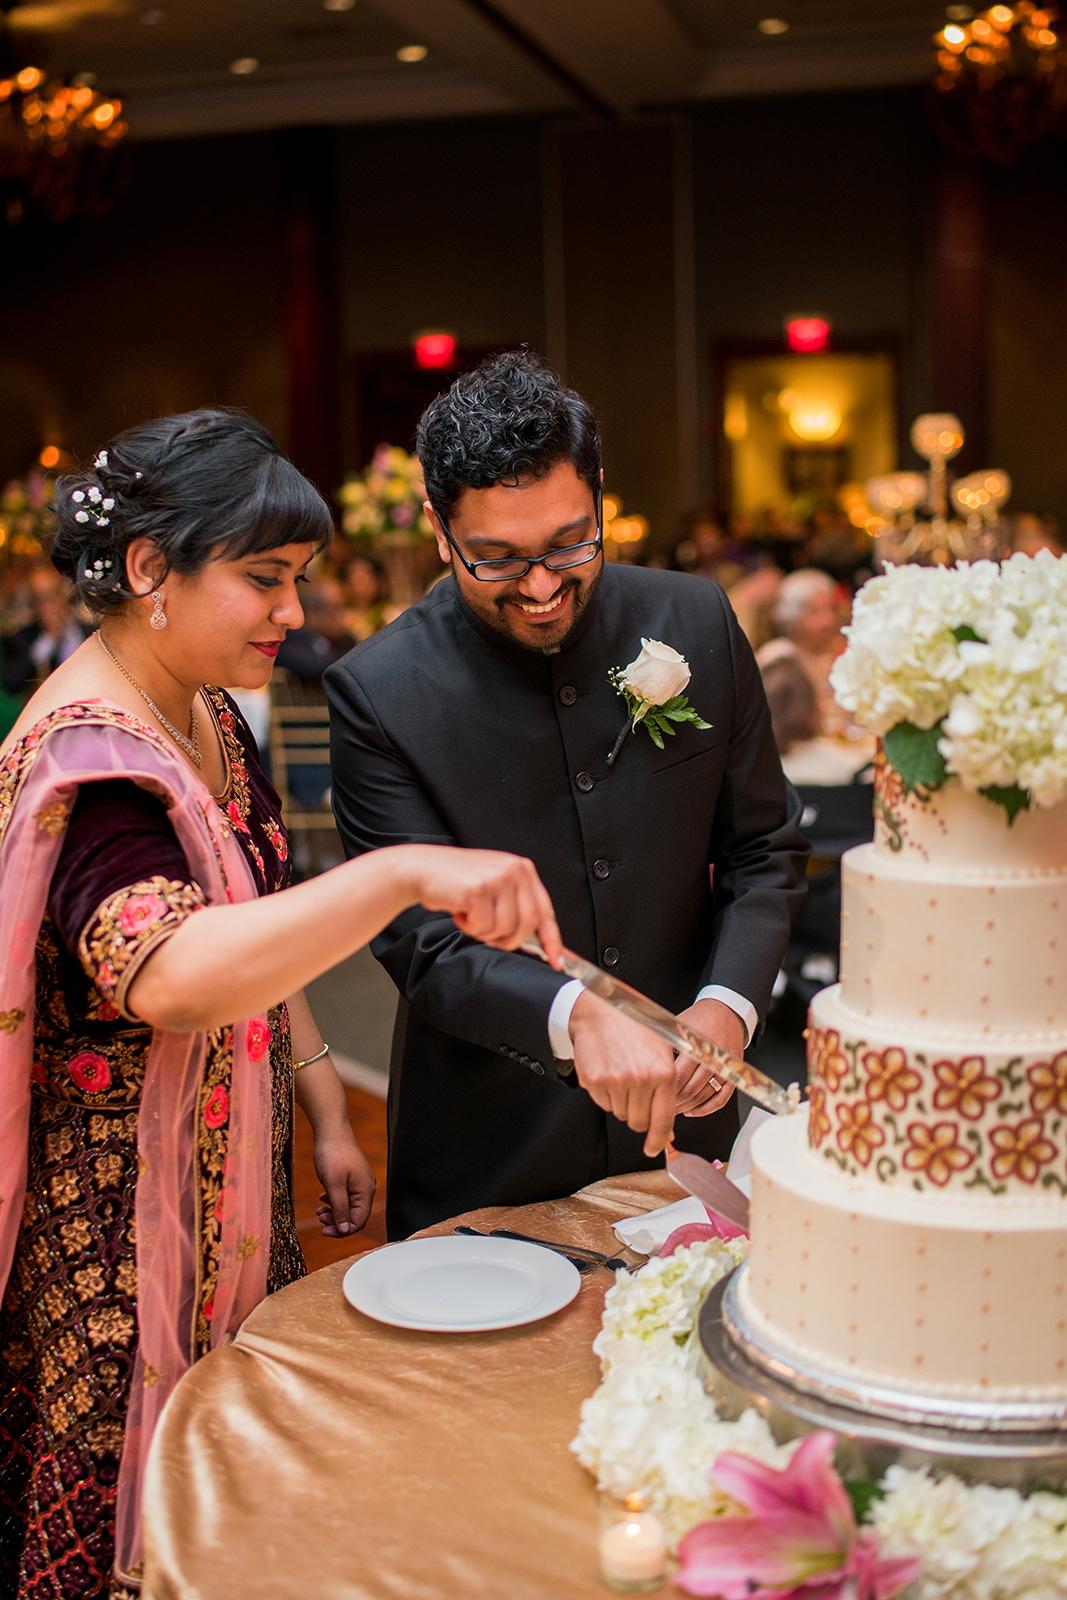 Le Cape Weddings - South Asian Wedding - Ishani and Sidhart - Wedding Reception-53.jpg